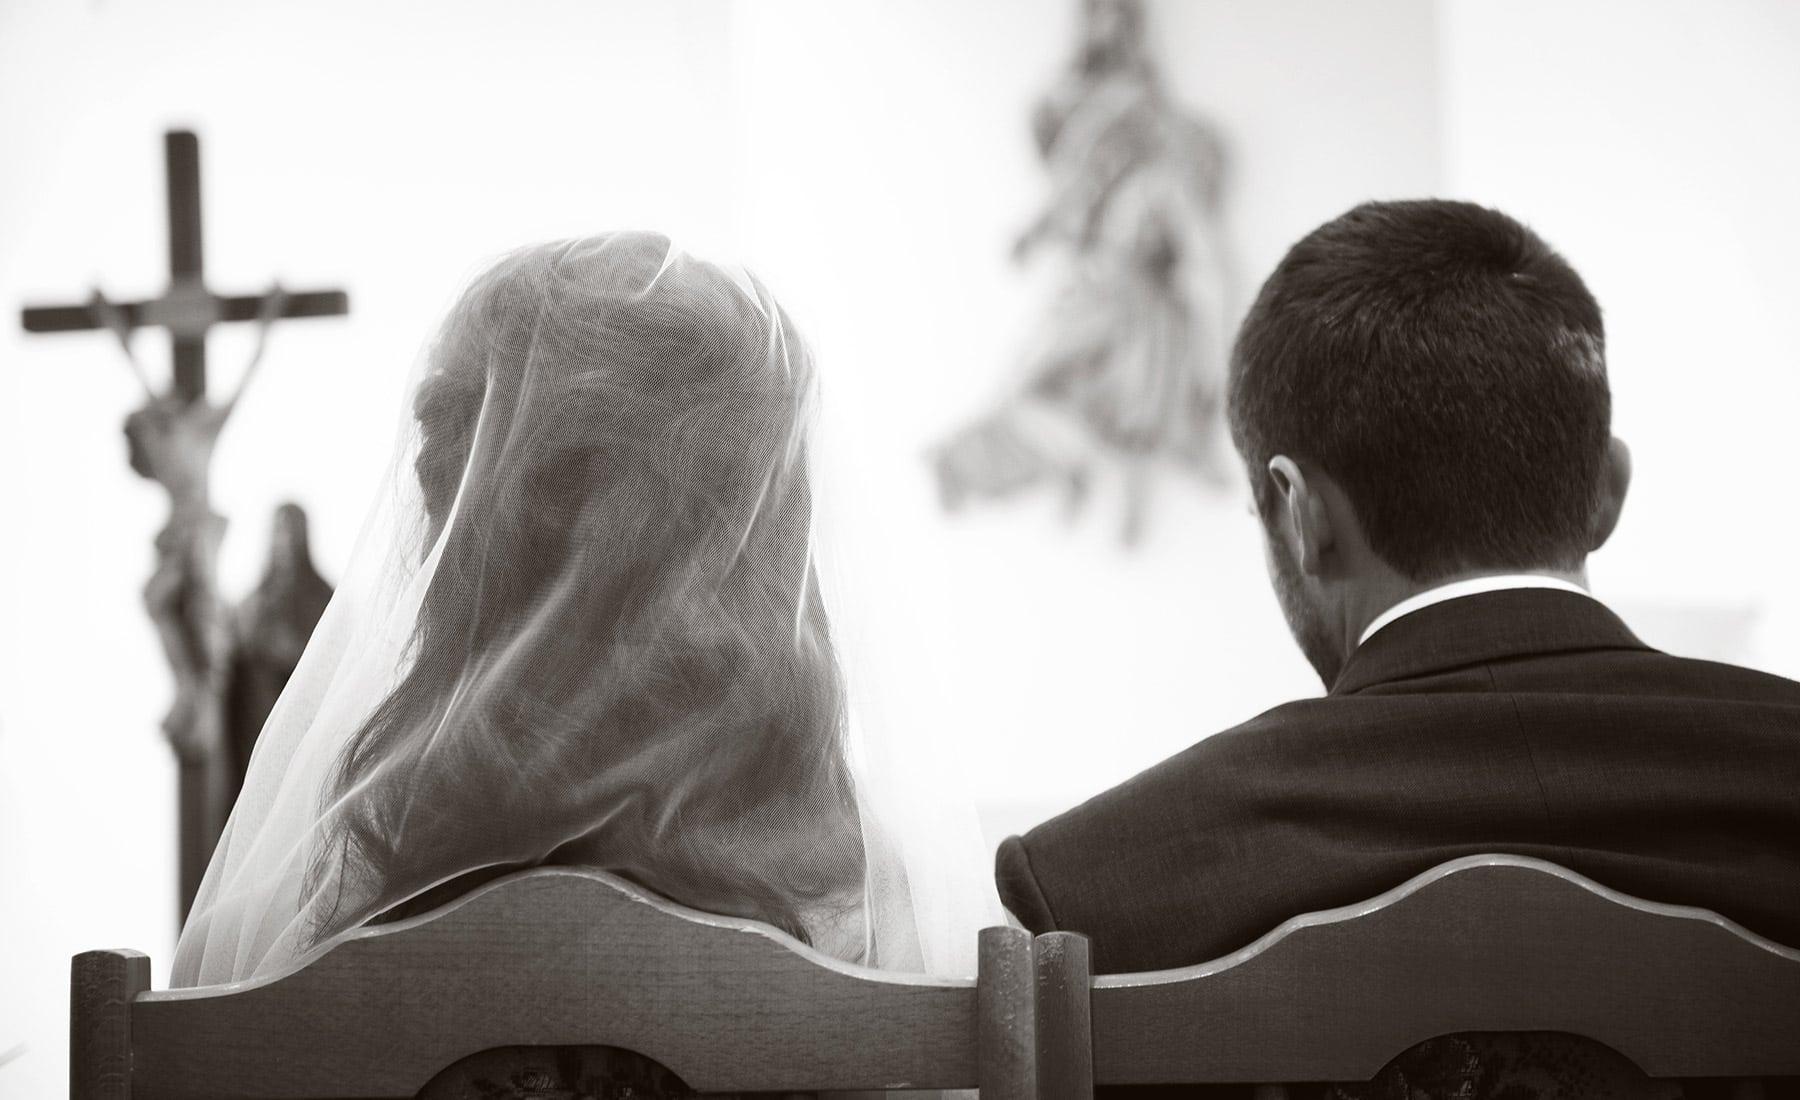 Matrimonio Catolico Separacion : Realidad del matrimonio hoy para toda pareja por tu matrimonio